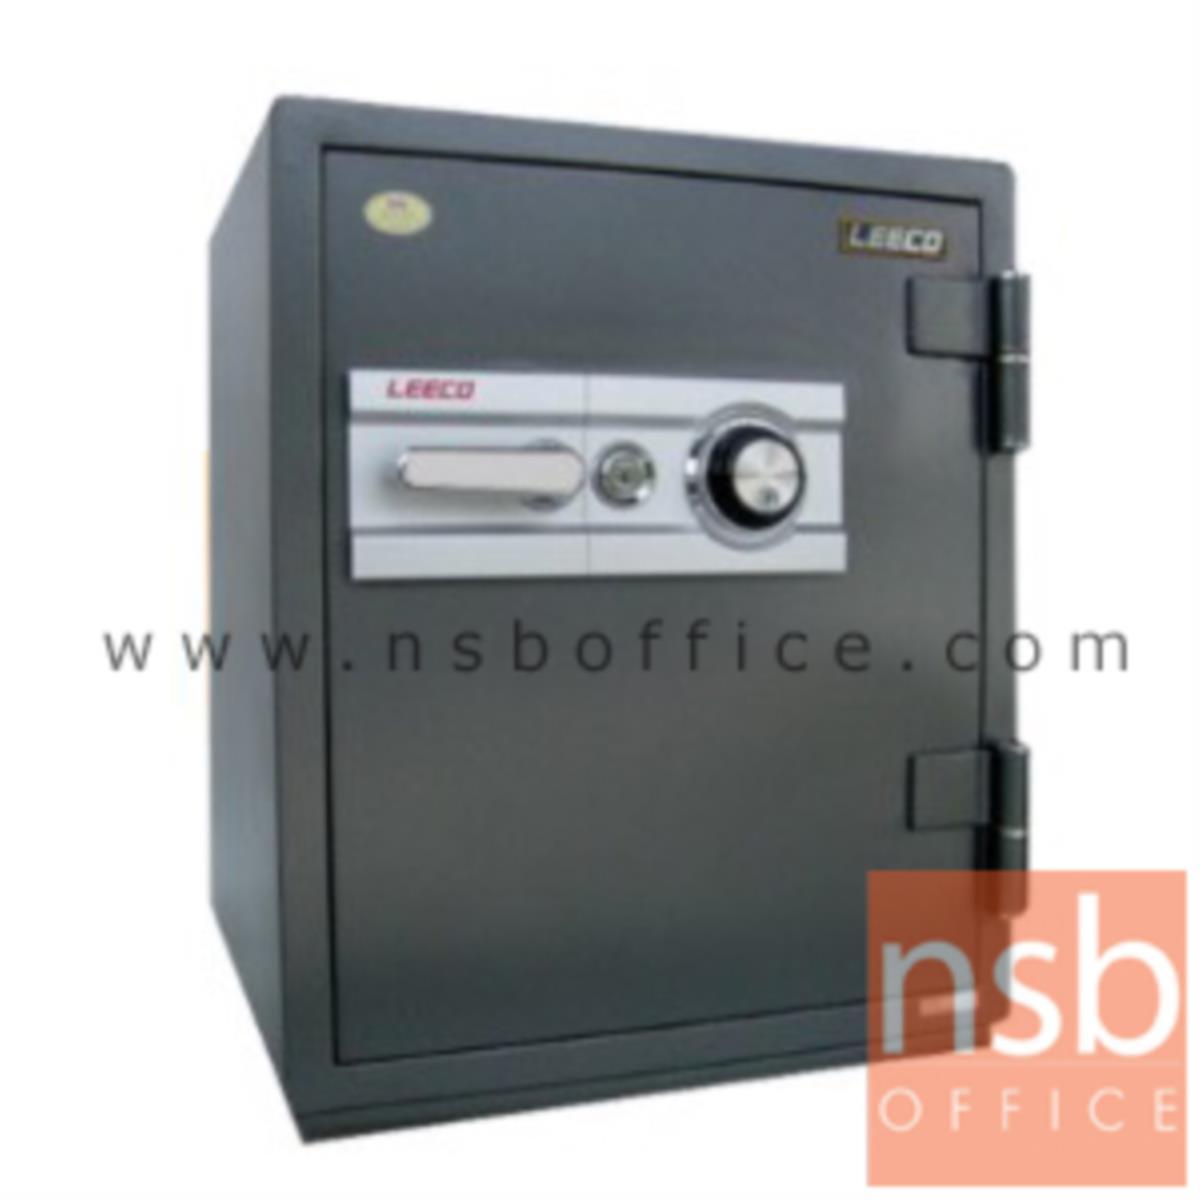 F02A057:ตู้เซฟนิรภัย 155 กก. ลีโก้ รุ่น Leeco 3700 (1 กุญแจ 1 รหัส)